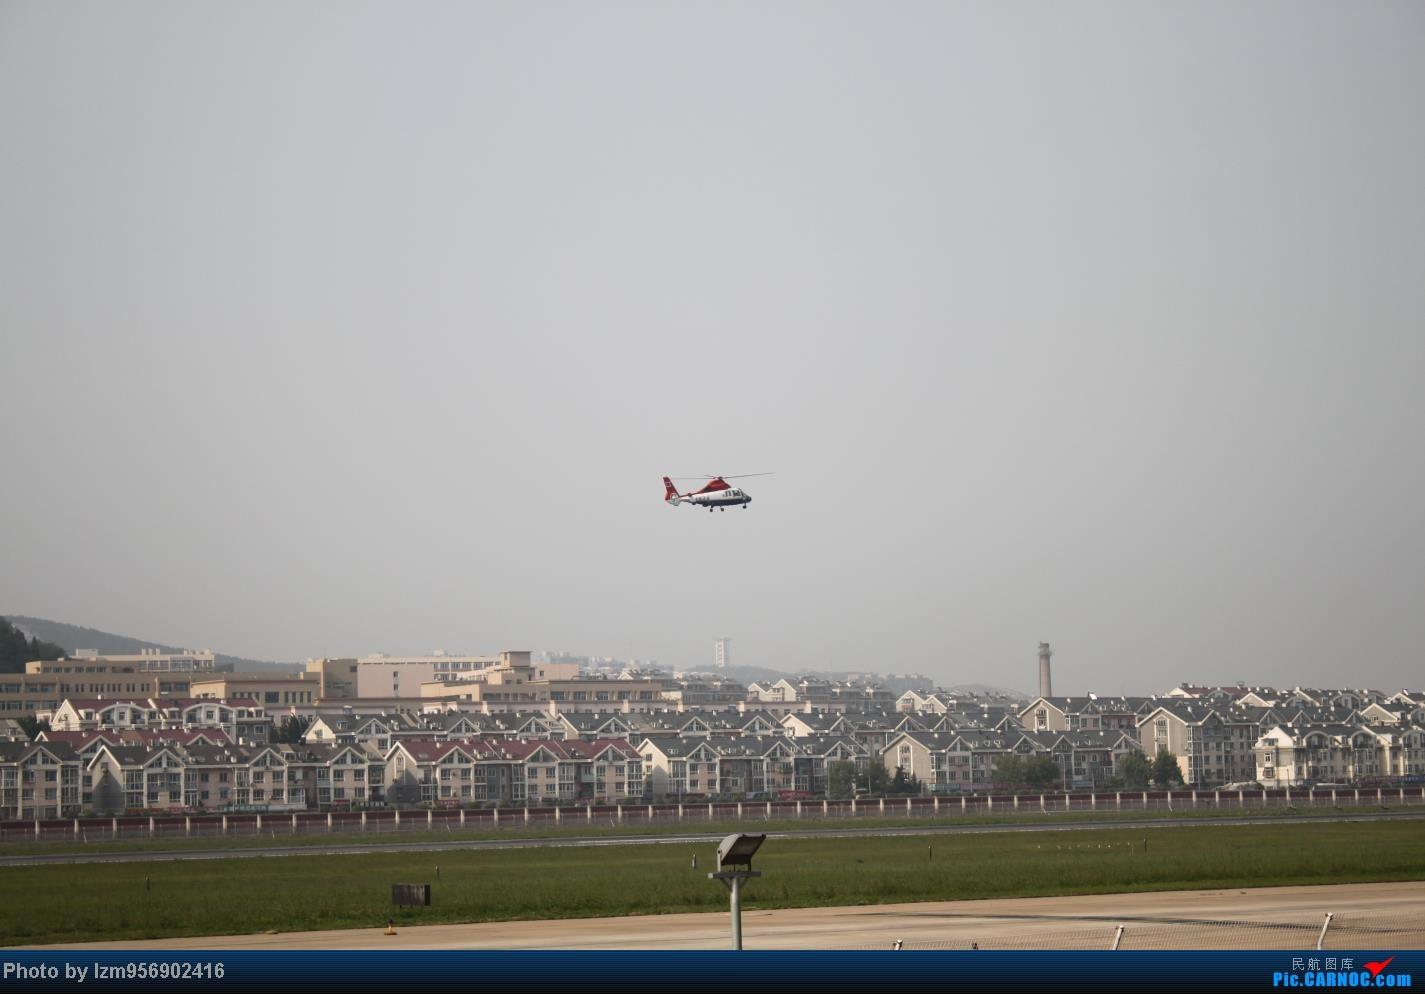 Re:[原创]DLC蹲点大半天,拍到了大棒航空772=w= 哈飞 直-9 B-7102 中国大连周水子机场